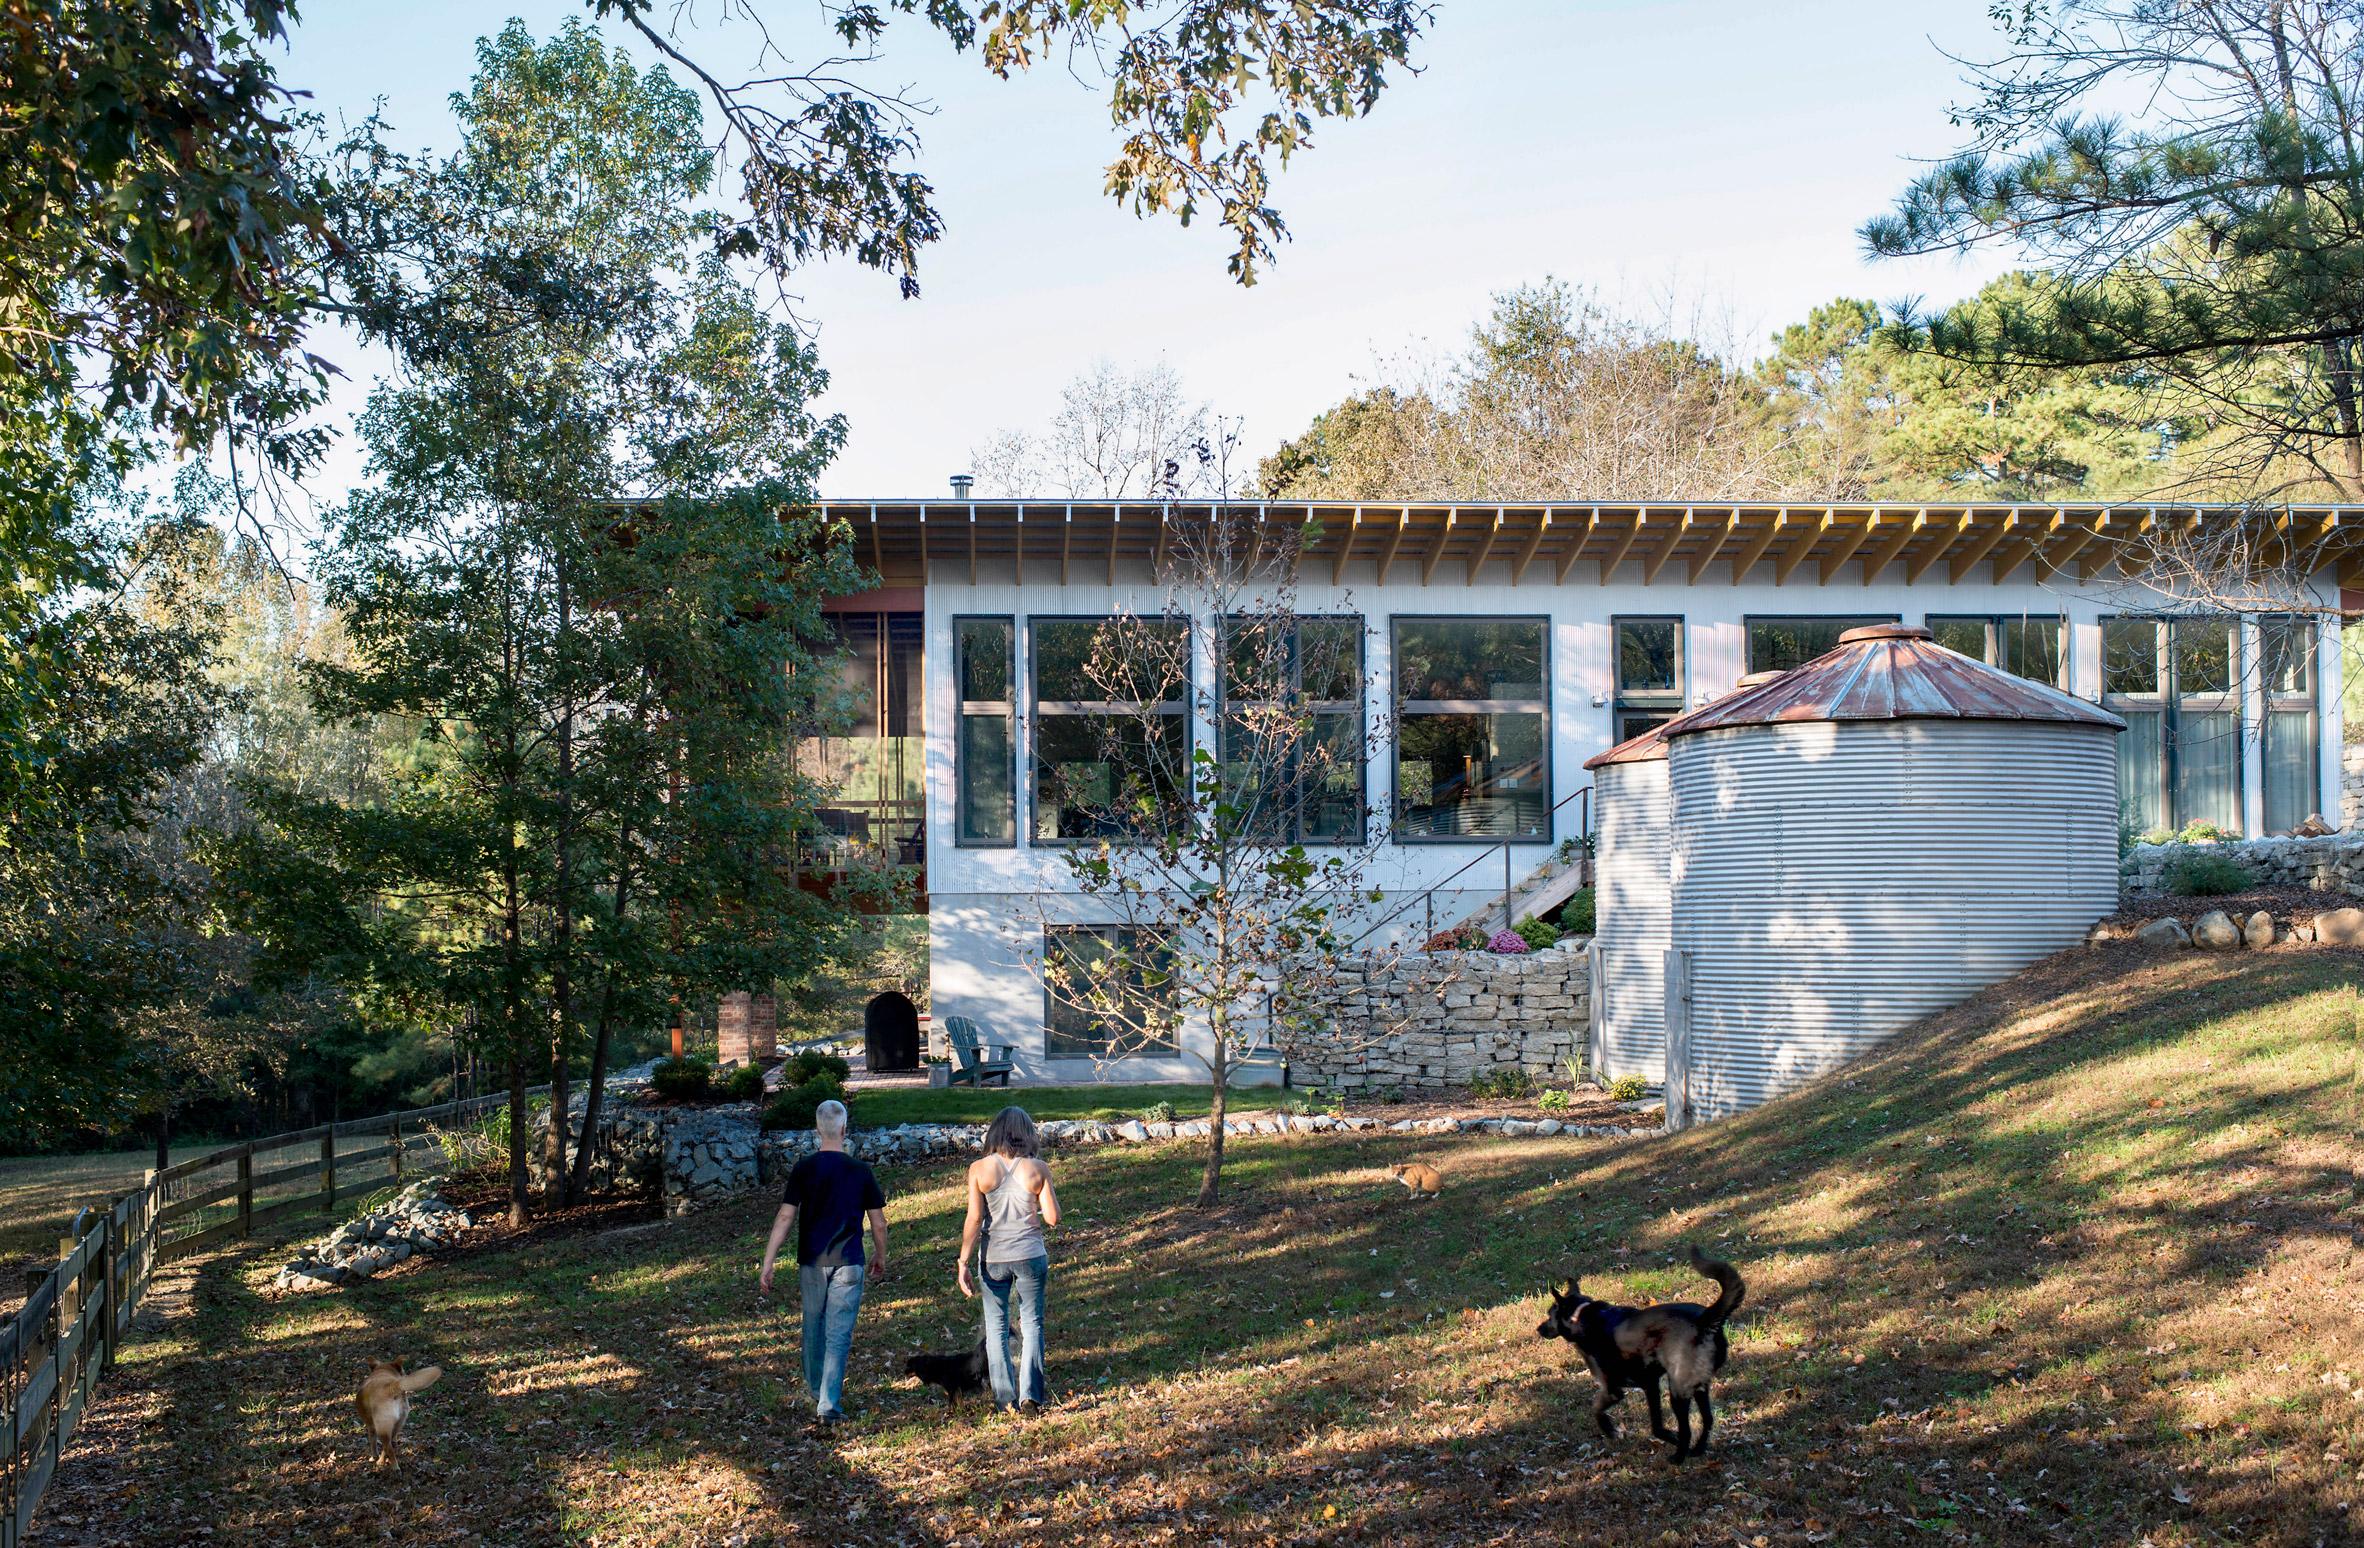 Horseshoe Farm Residence by Buildsense